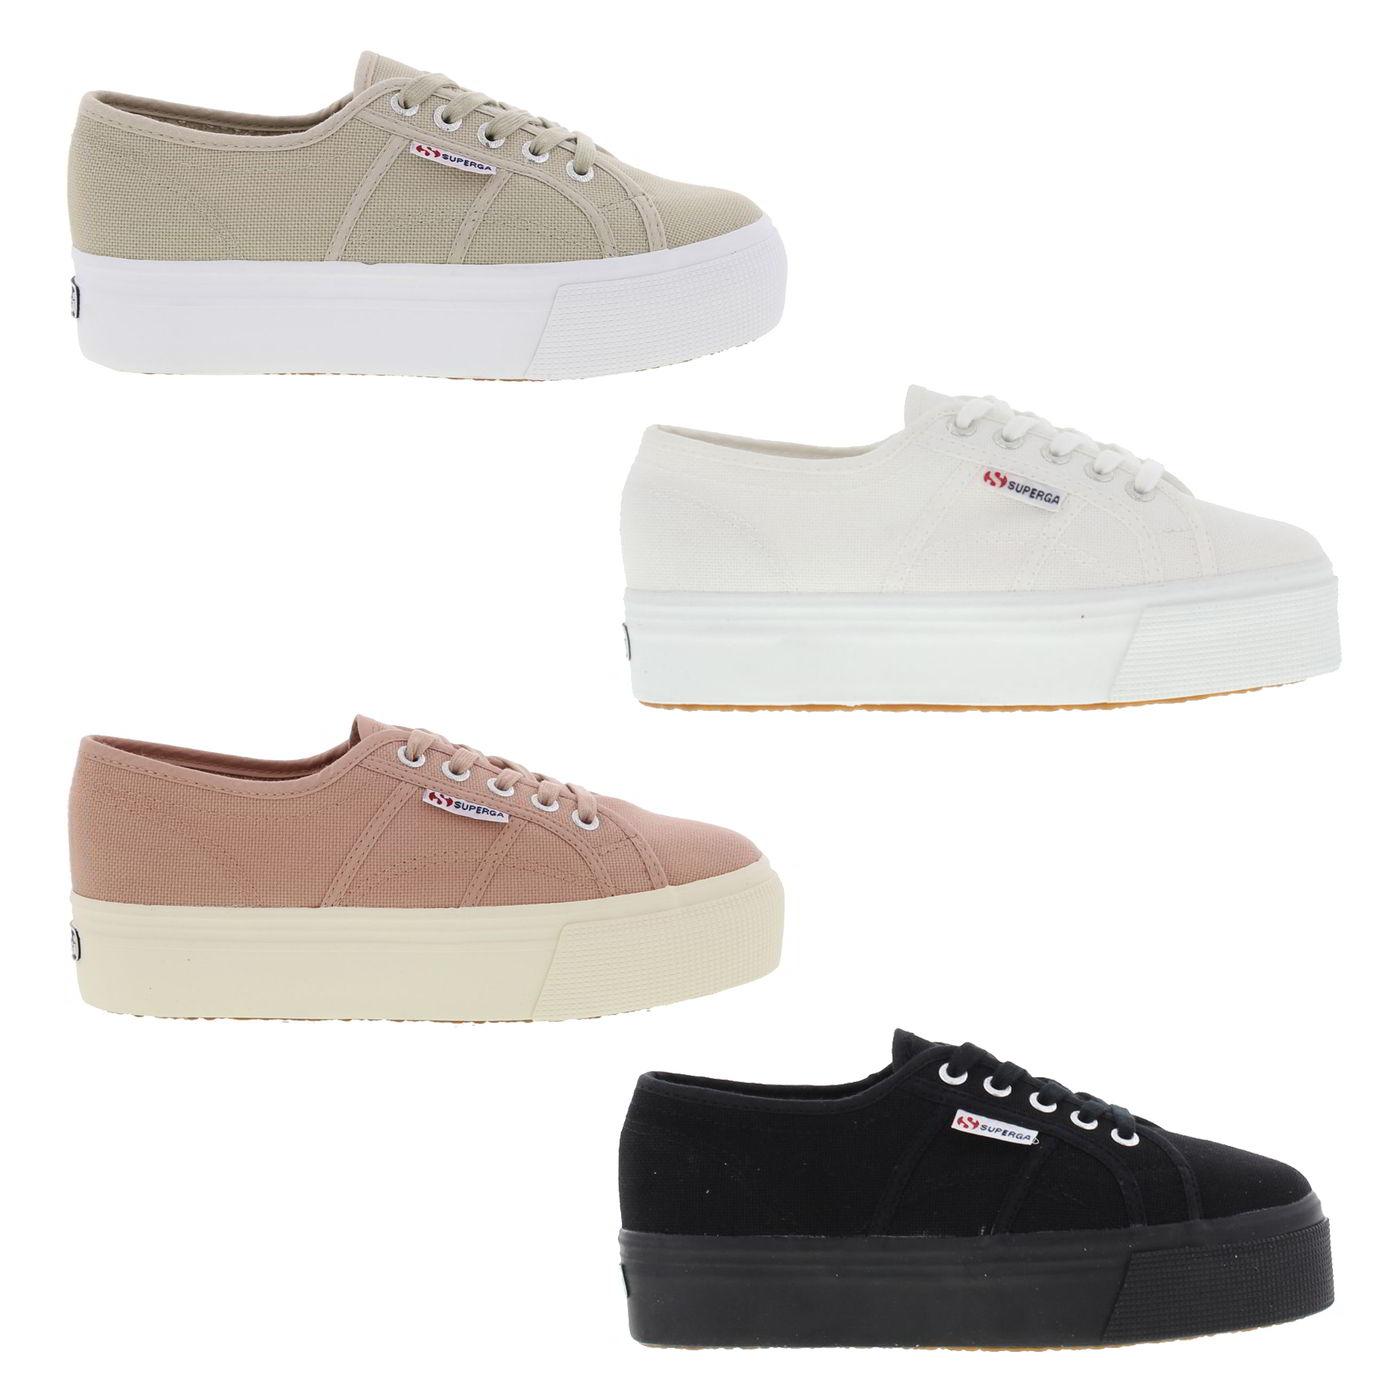 c8c6dca8b56 Superga 2790 Womens Black White Pink Chunky Platform Trainers Shoes ...